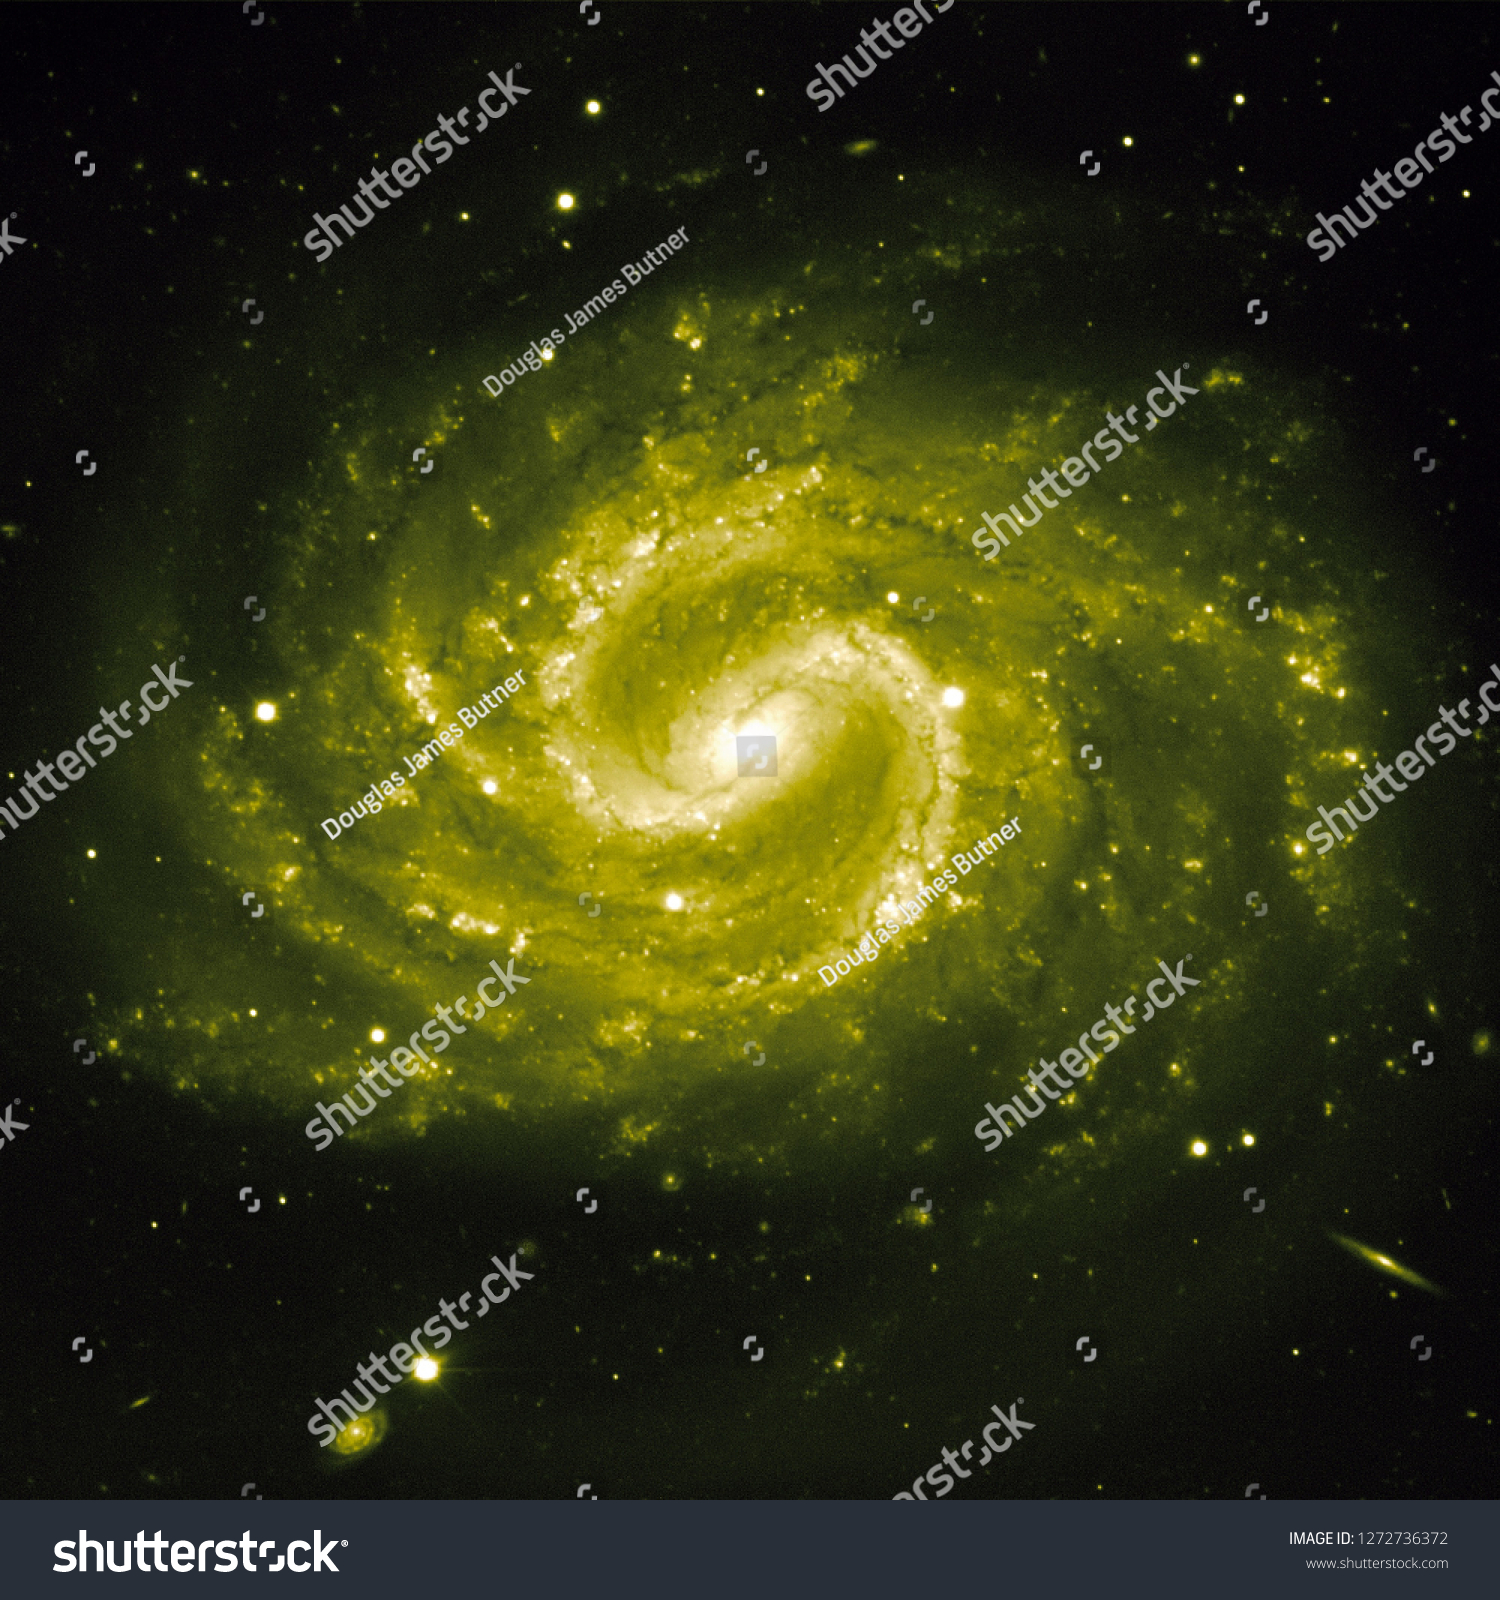 stock photo the lost galaxy recolored yellow galaxy universe nebula background wallpaper original image by eso 1272736372